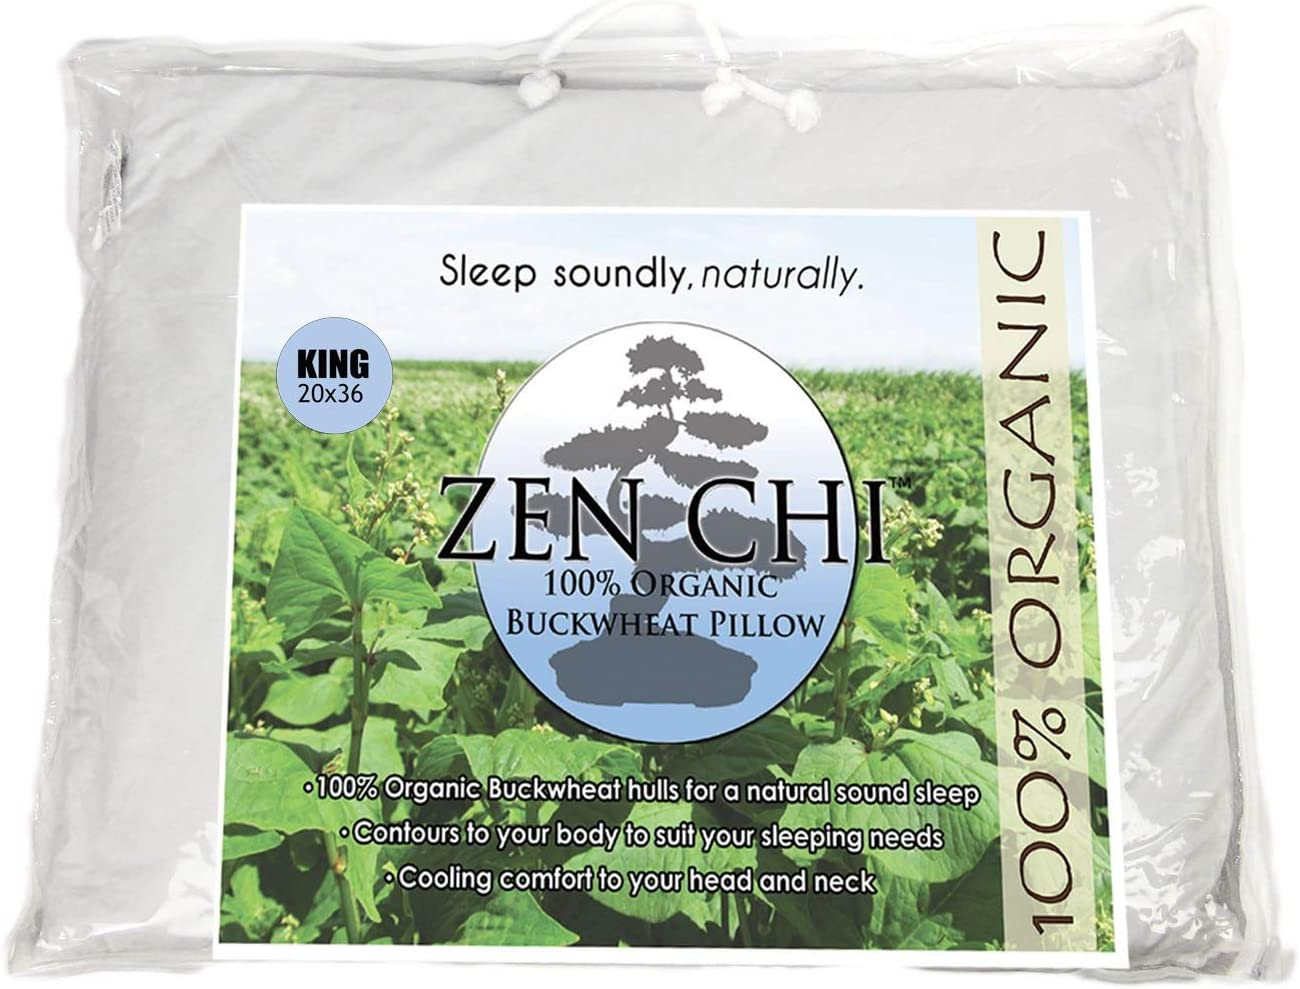 "ZEN CHI Buckwheat Pillow- Organic King Size (20""X36"") w Natural Cooling Technology- All Cotton Cover w Organic Buckwheat Hulls"